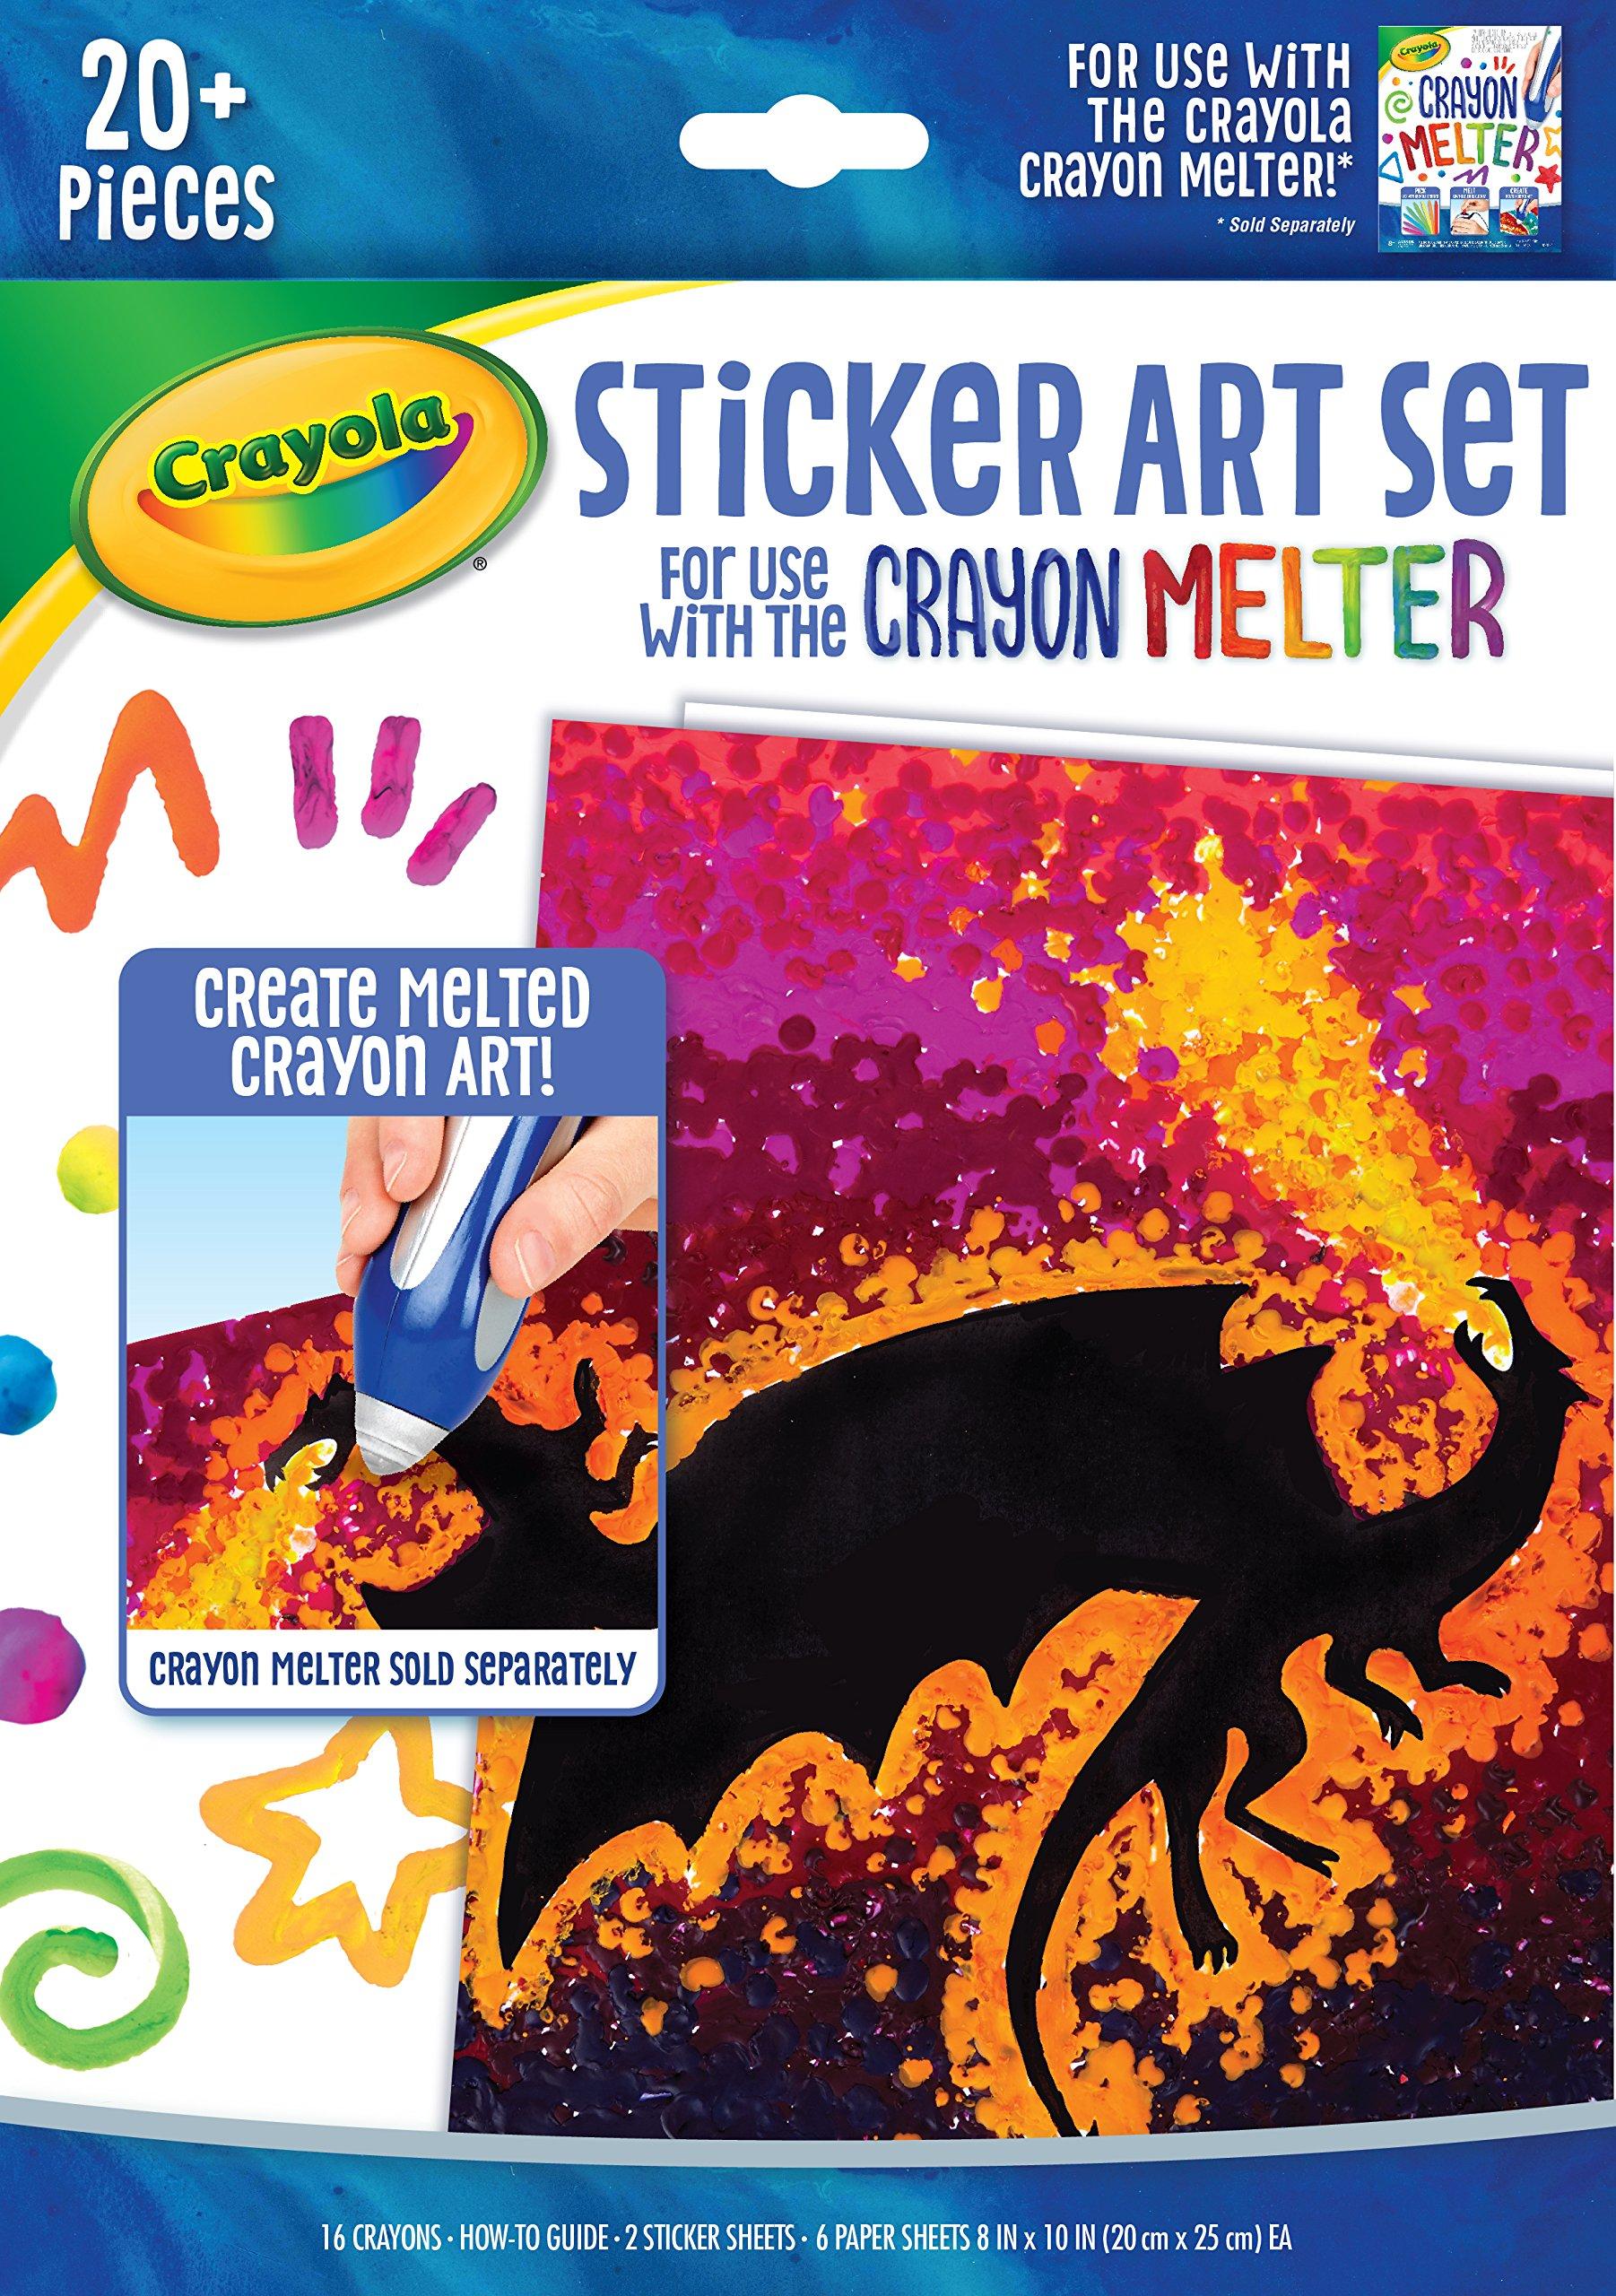 Crayola Ultimelt Pen Multisurface Crayon Melting Creative Kit for Arts Crafts